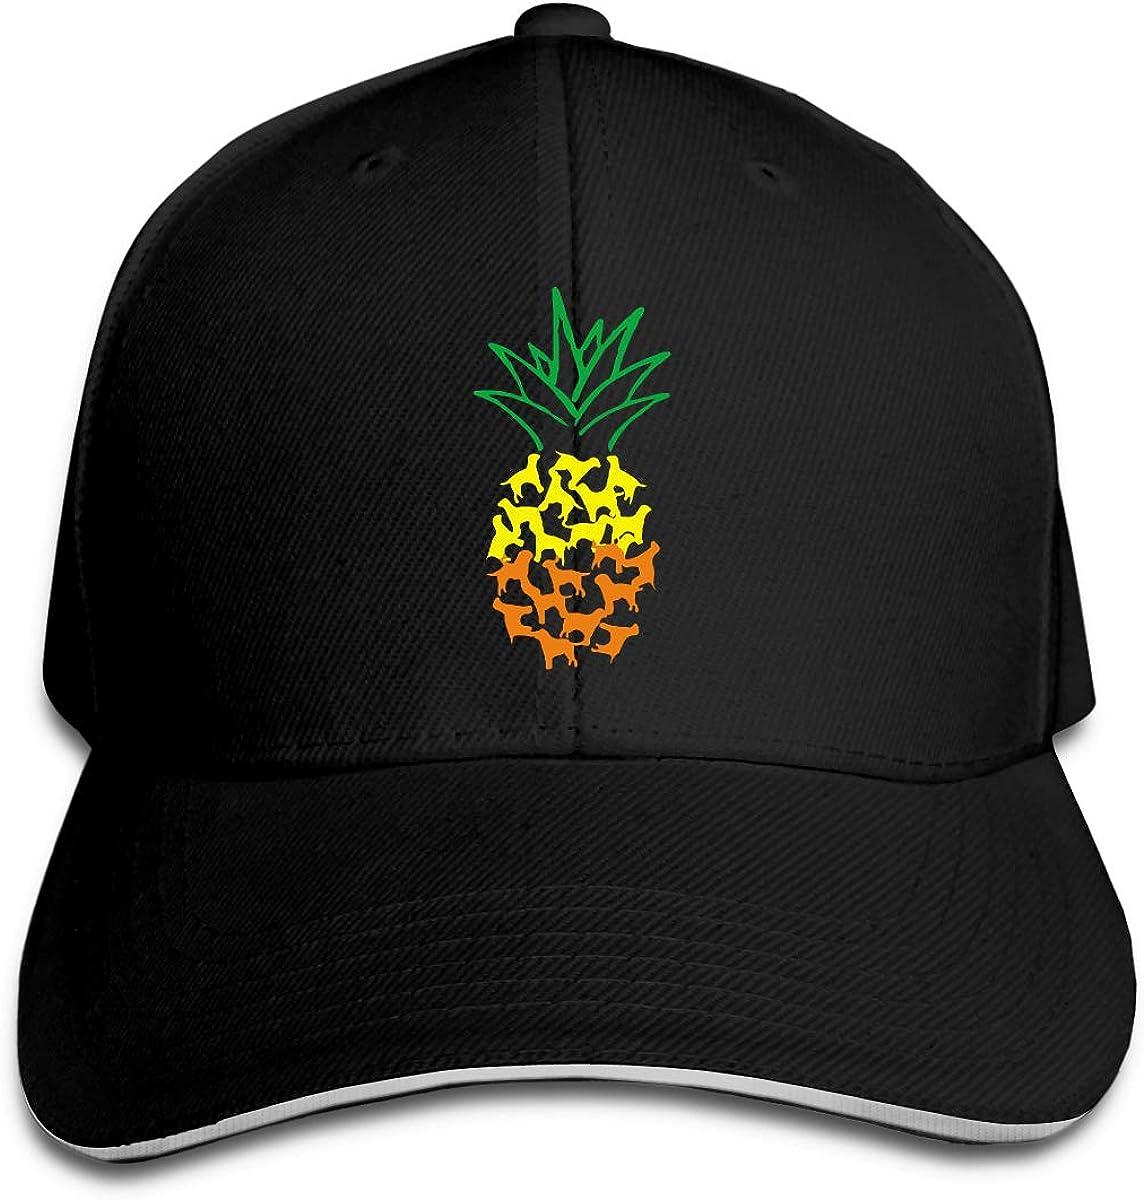 Labrador Retriever Pineapple Outdoor Snapback Sandwich Cap Adjustable Baseball Hat Street Rapper Hat